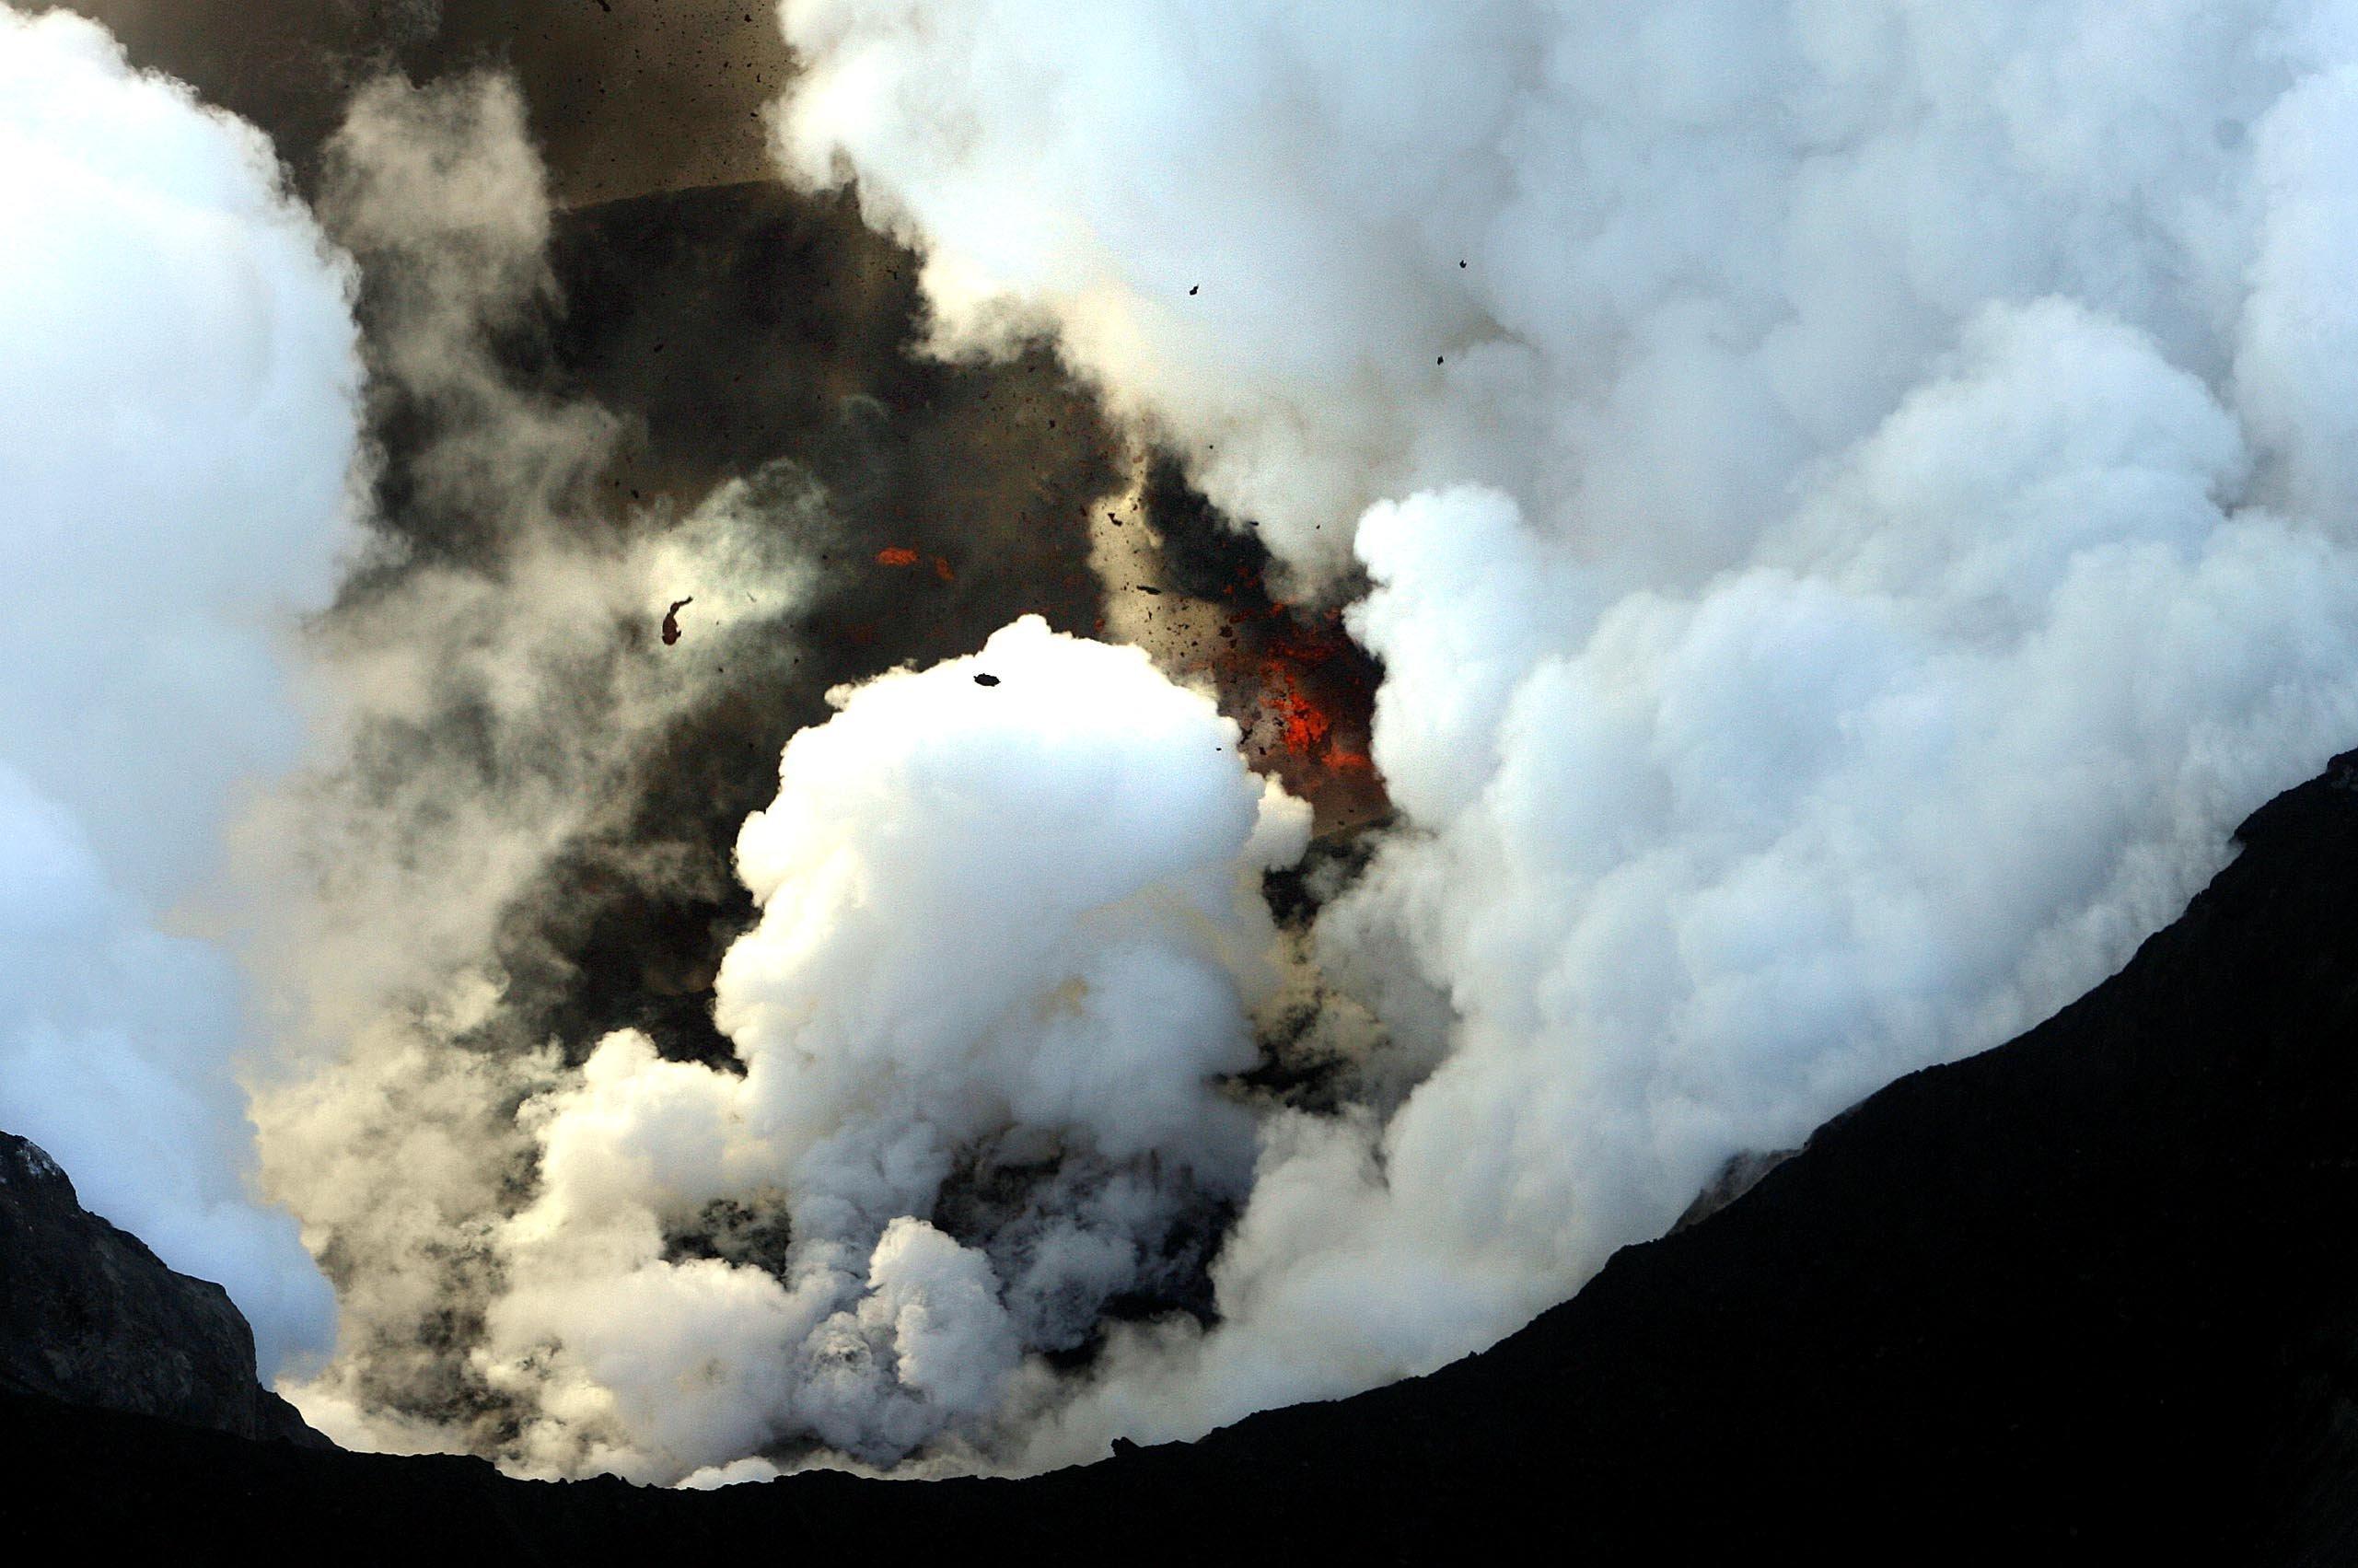 Le volcan islandais Eyjafjöll en éruption (avril 2010)